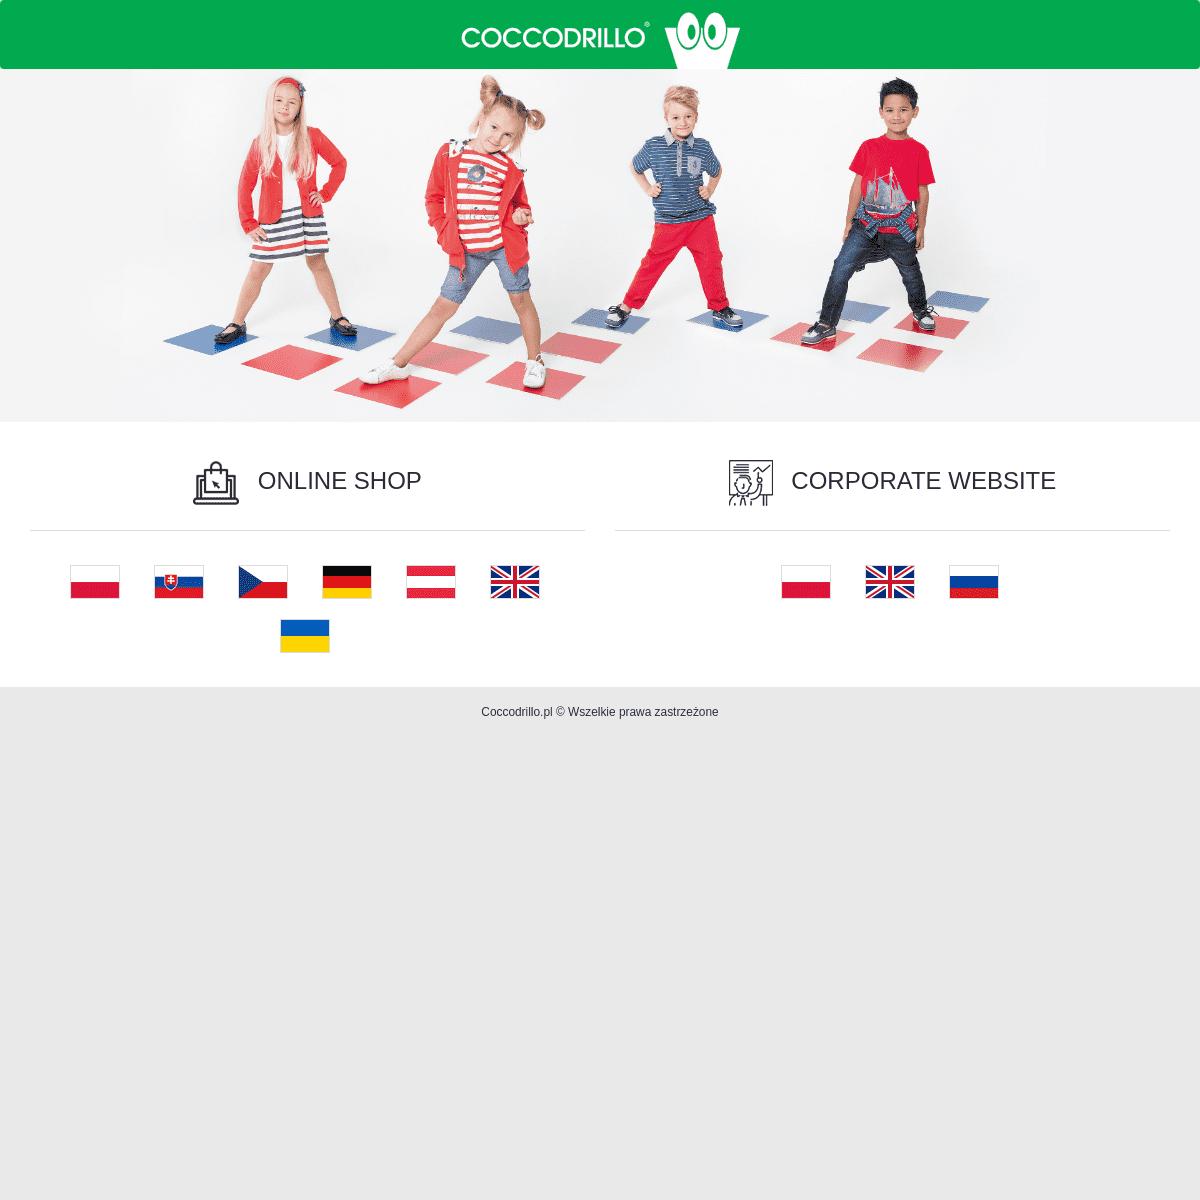 Online Shop - Coccodrillo